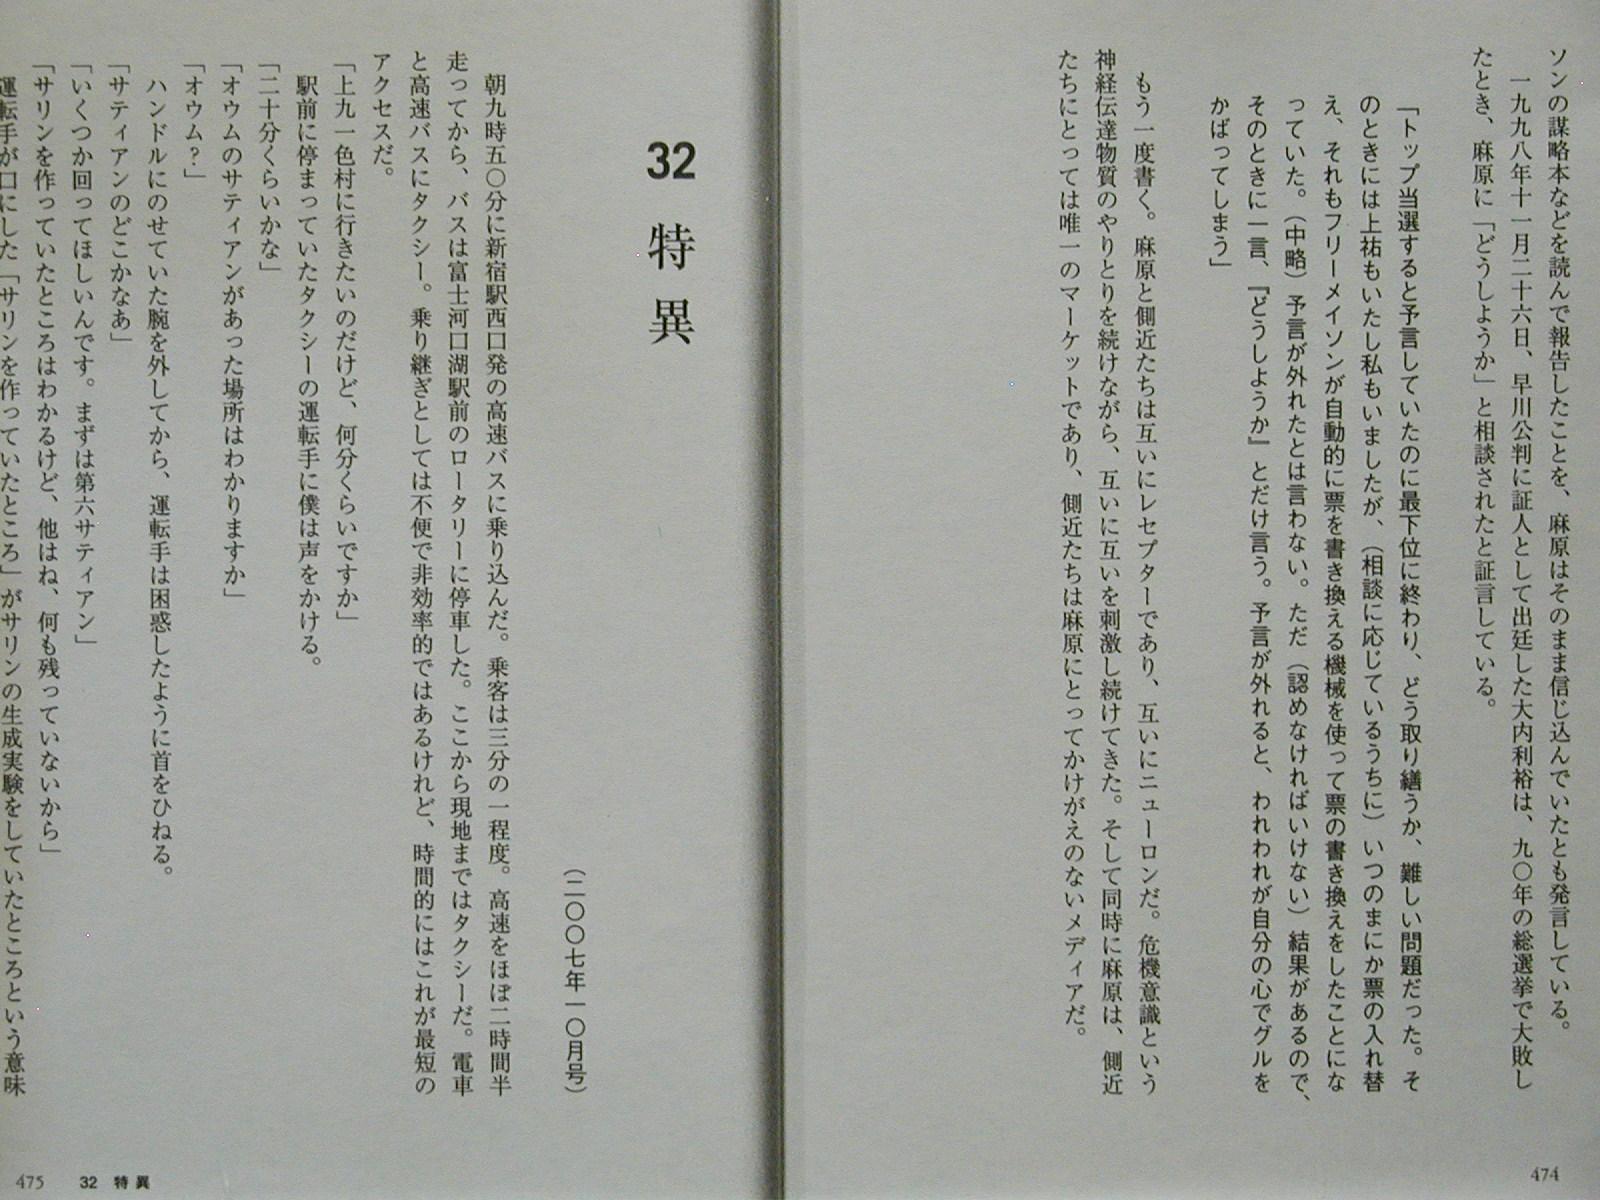 A3 P474ー475